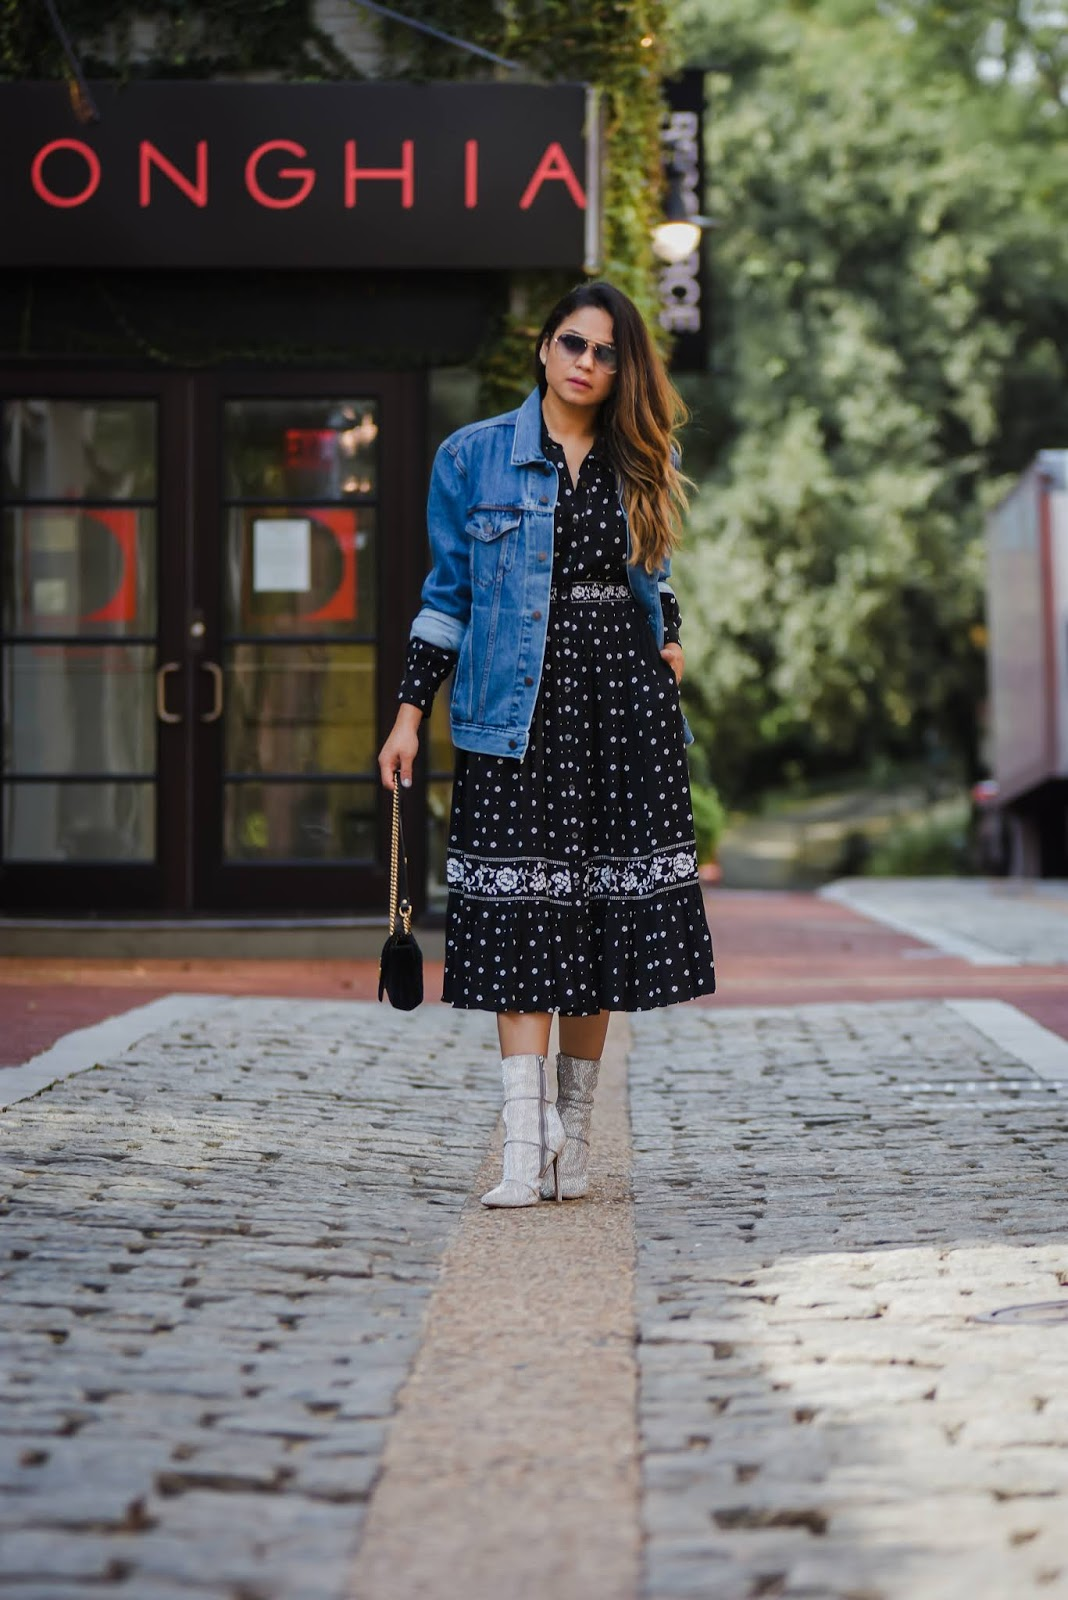 kate spade bandana dress, black dress, supersized denim jacket, boyfriedn jakcet, street style, holiday look, party look, fall fashion, steve madden sparkly booties,  myriad musings